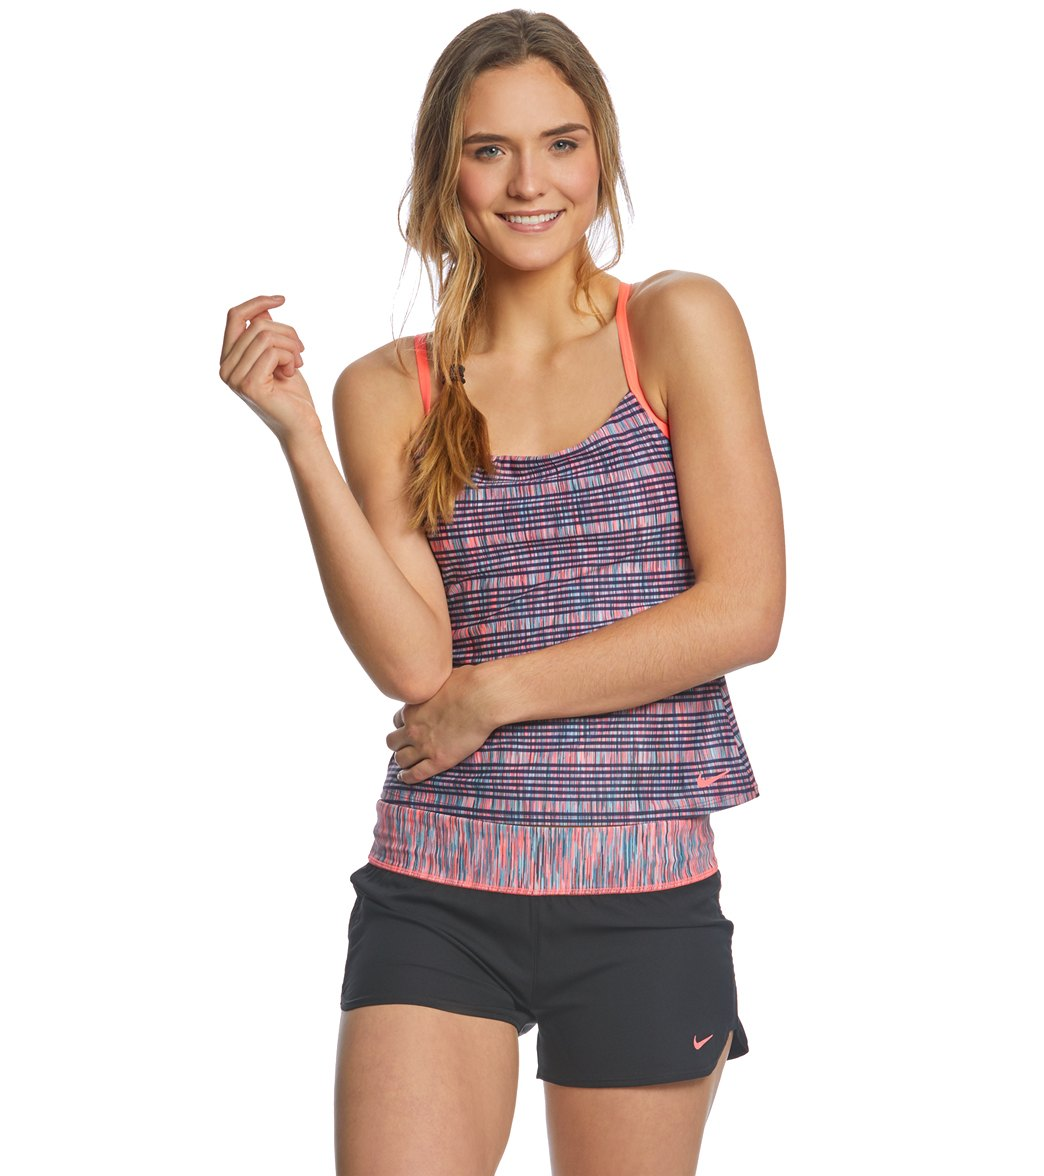 8337984b9e Nike Women's Sport Tankini Top at SwimOutlet.com - Free Shipping